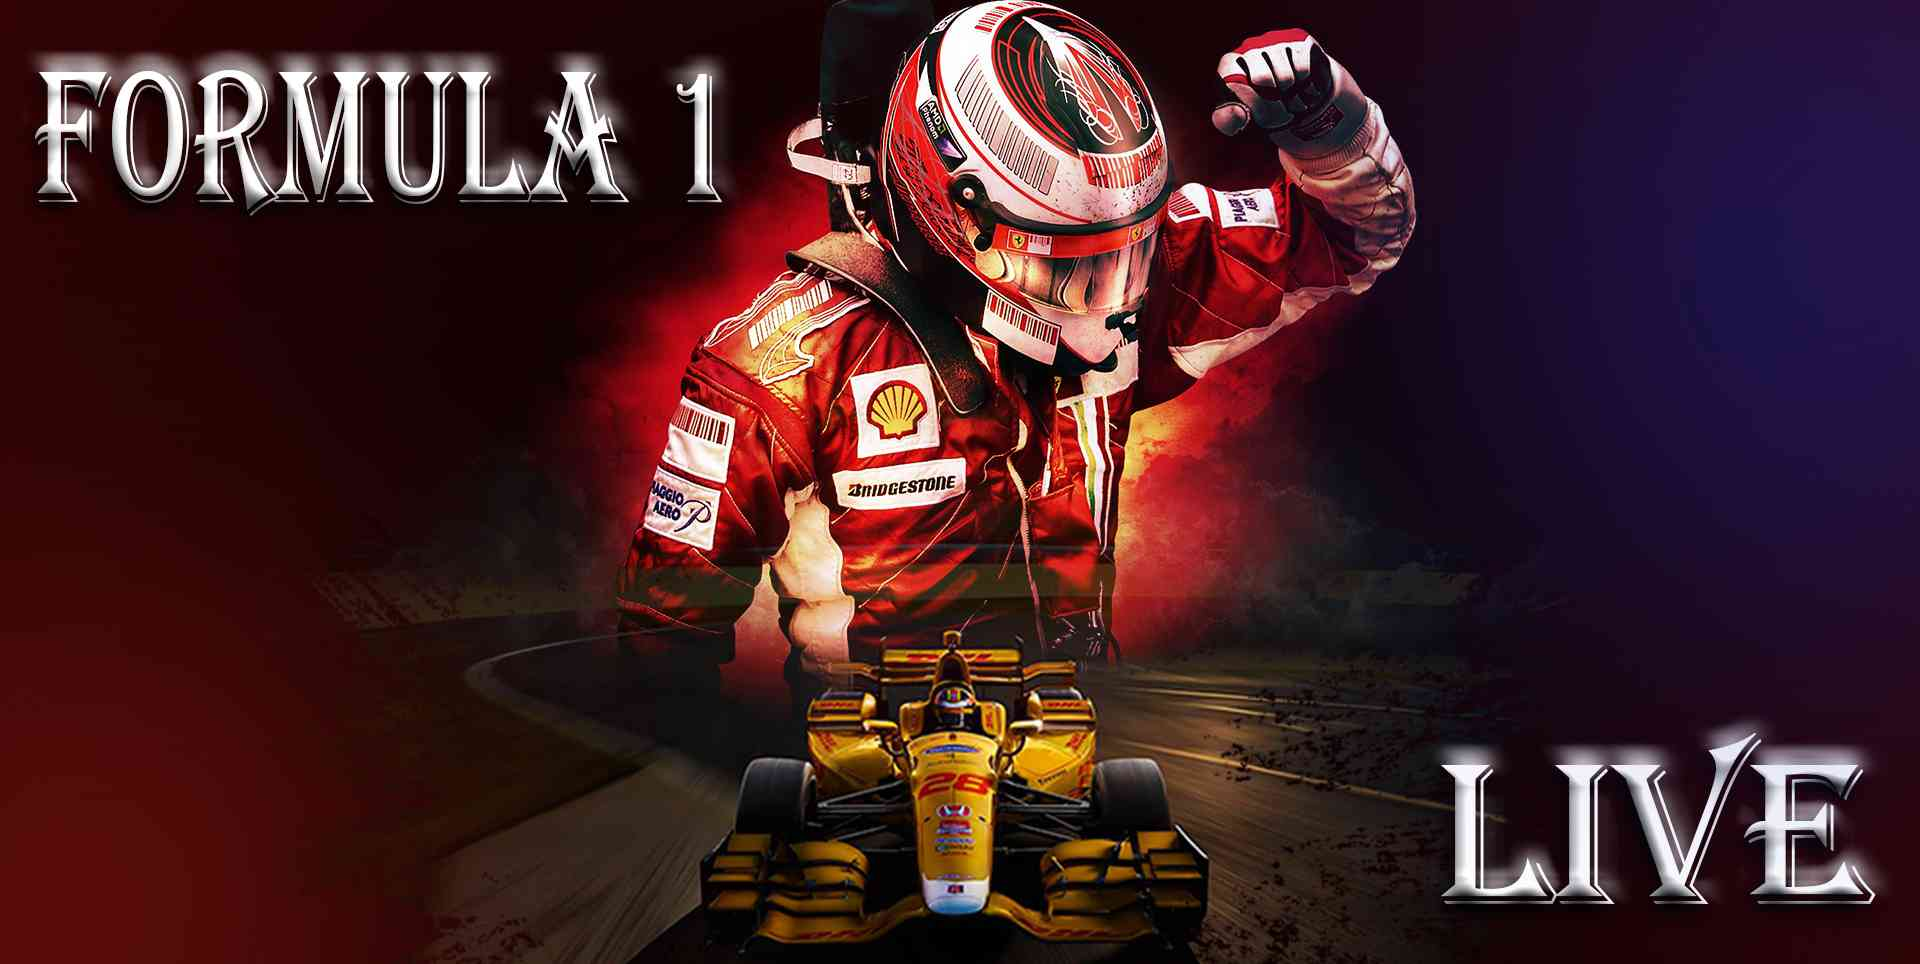 2016-formula-1-bahrain-grand-prix-live